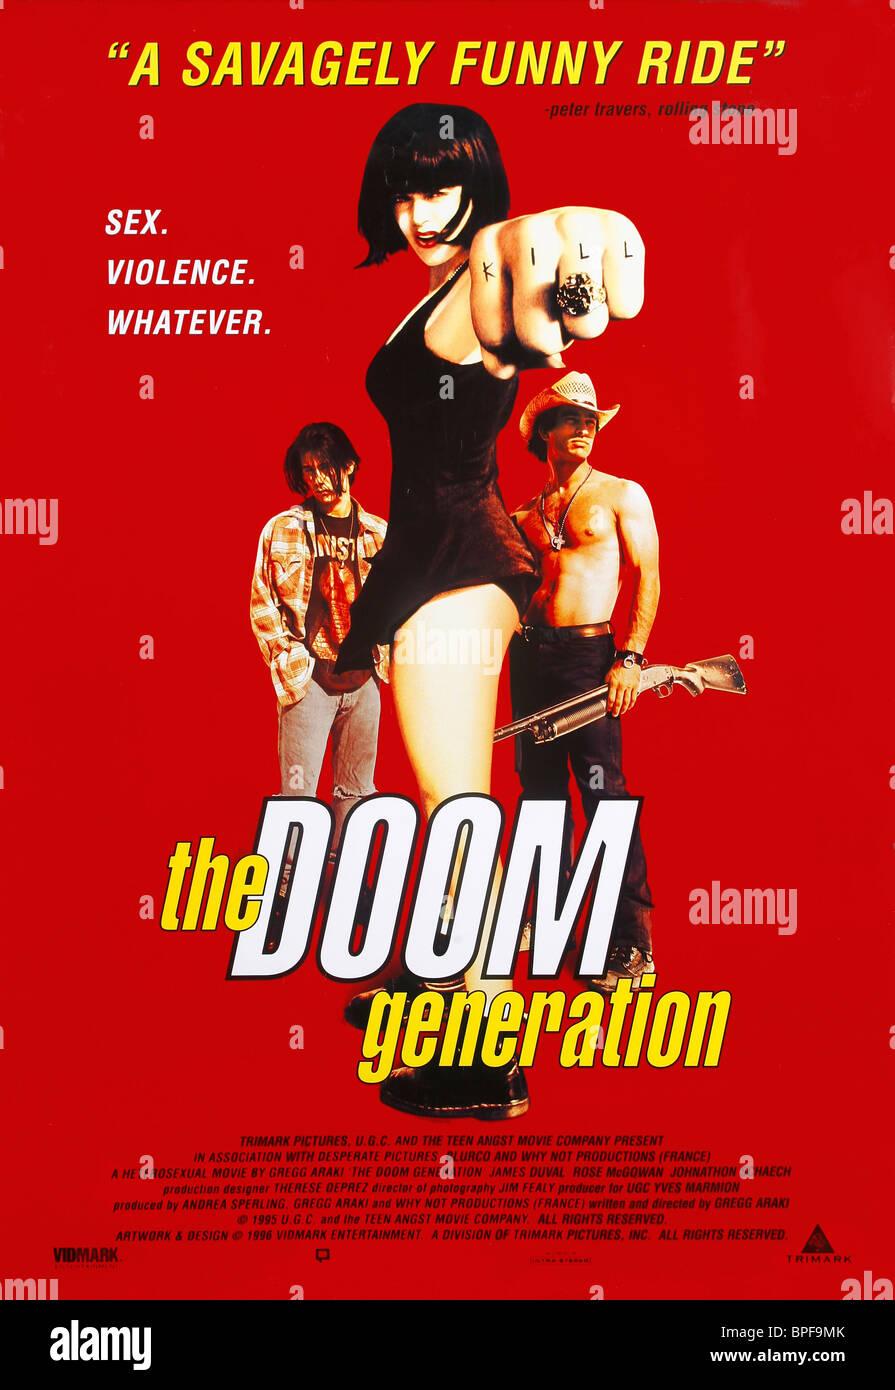 FILM POSTER THE DOOM GENERATION (1995) - Stock Image